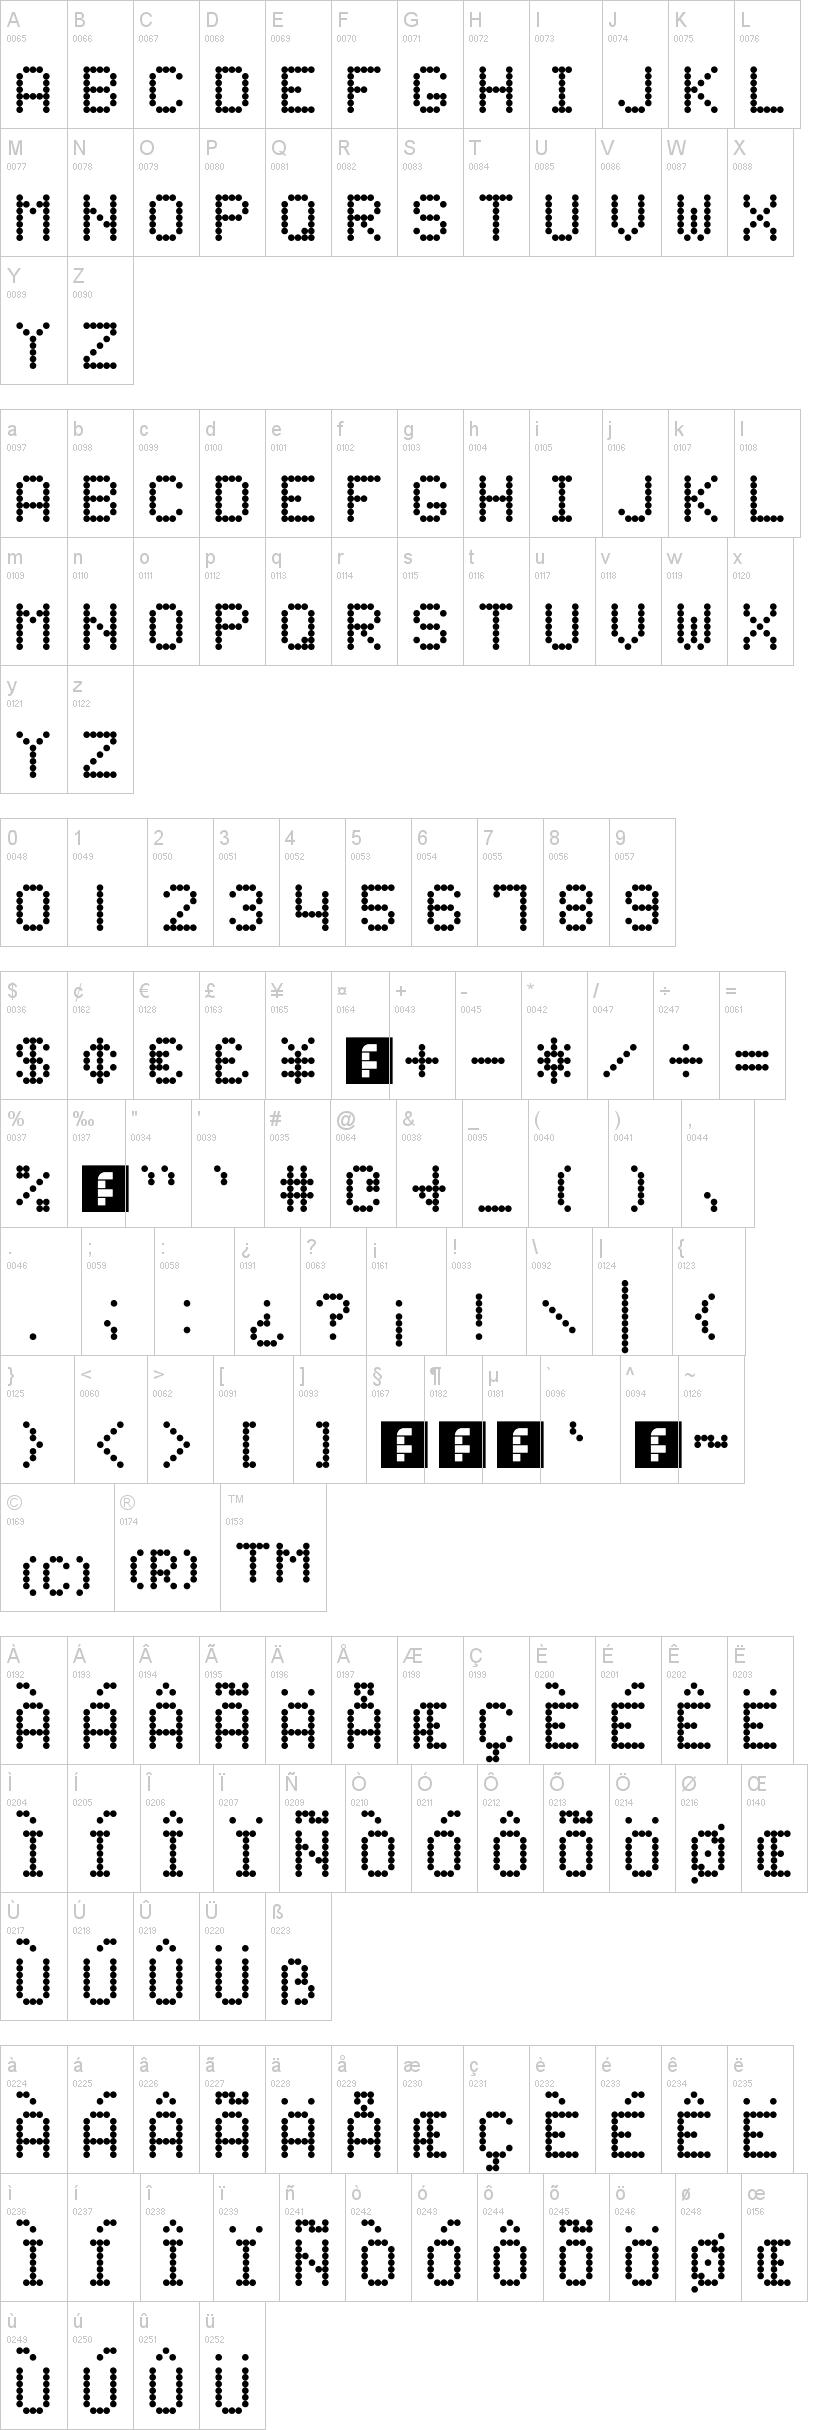 60s Scoreboard Font | dafont com